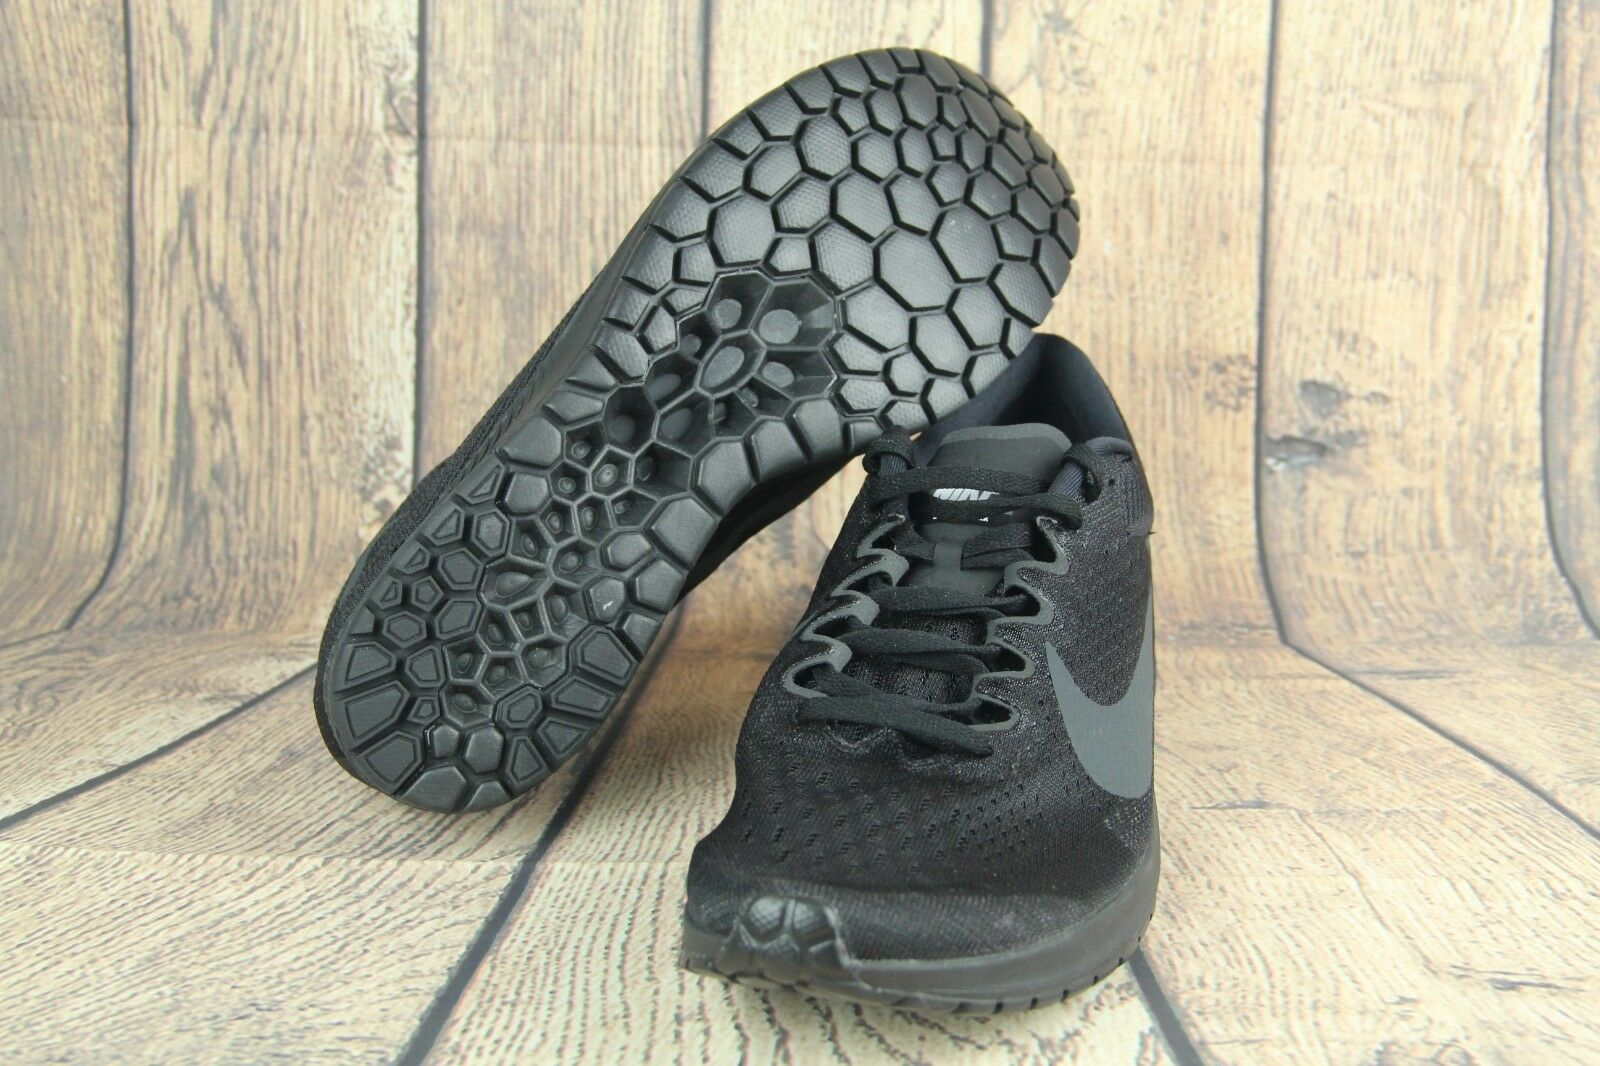 Donna, Di Nike Air Jordan 1 Aj1 Ribelle Xx Mattoni Di Donna, Orangevolume 5Ao1530 800 38bebb